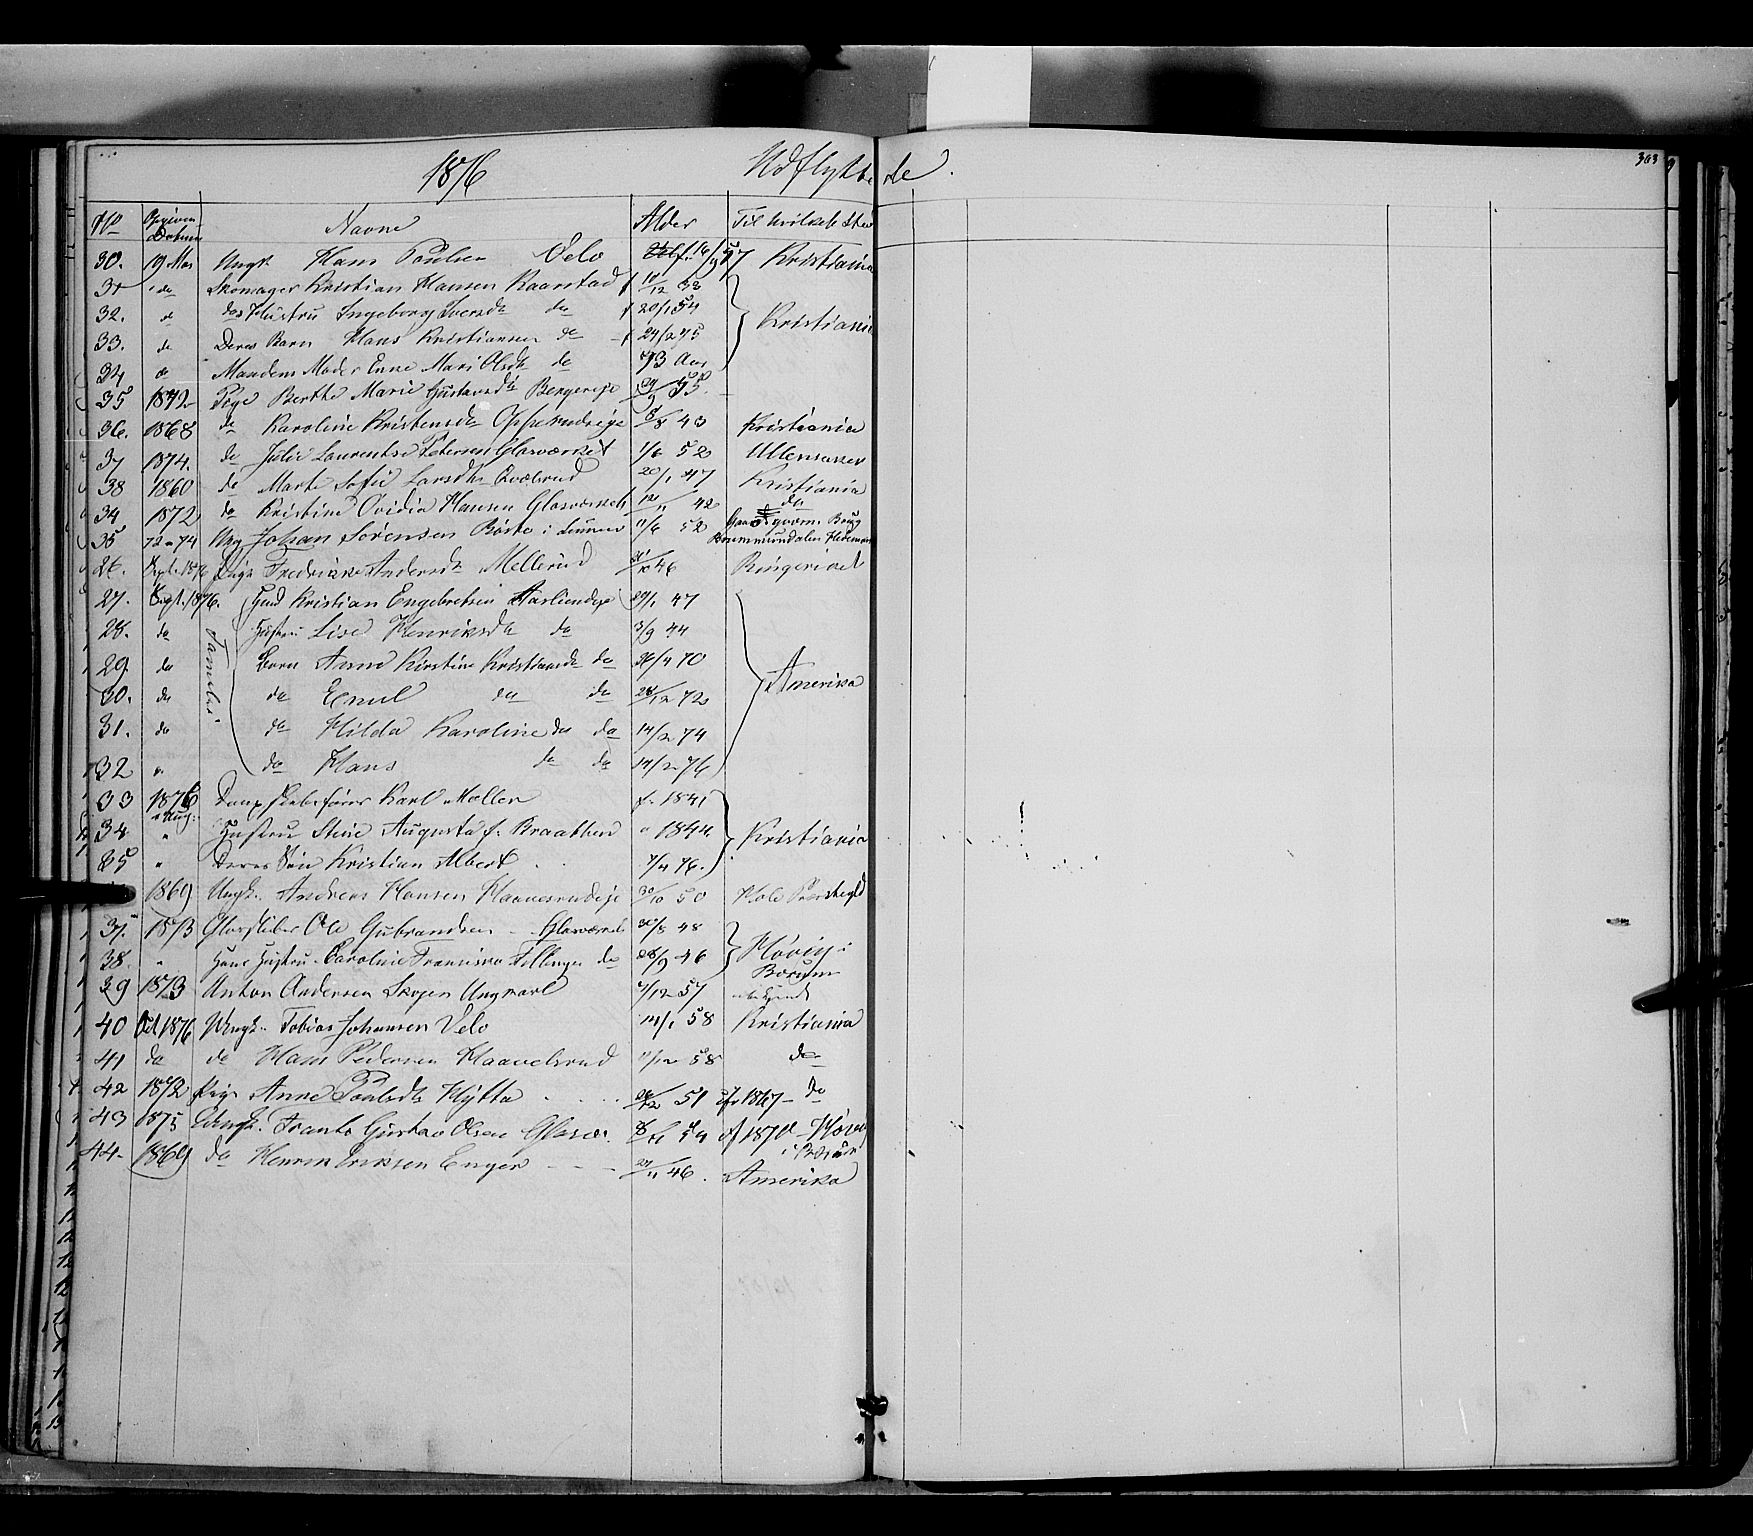 SAH, Jevnaker prestekontor, Ministerialbok nr. 7, 1858-1876, s. 303